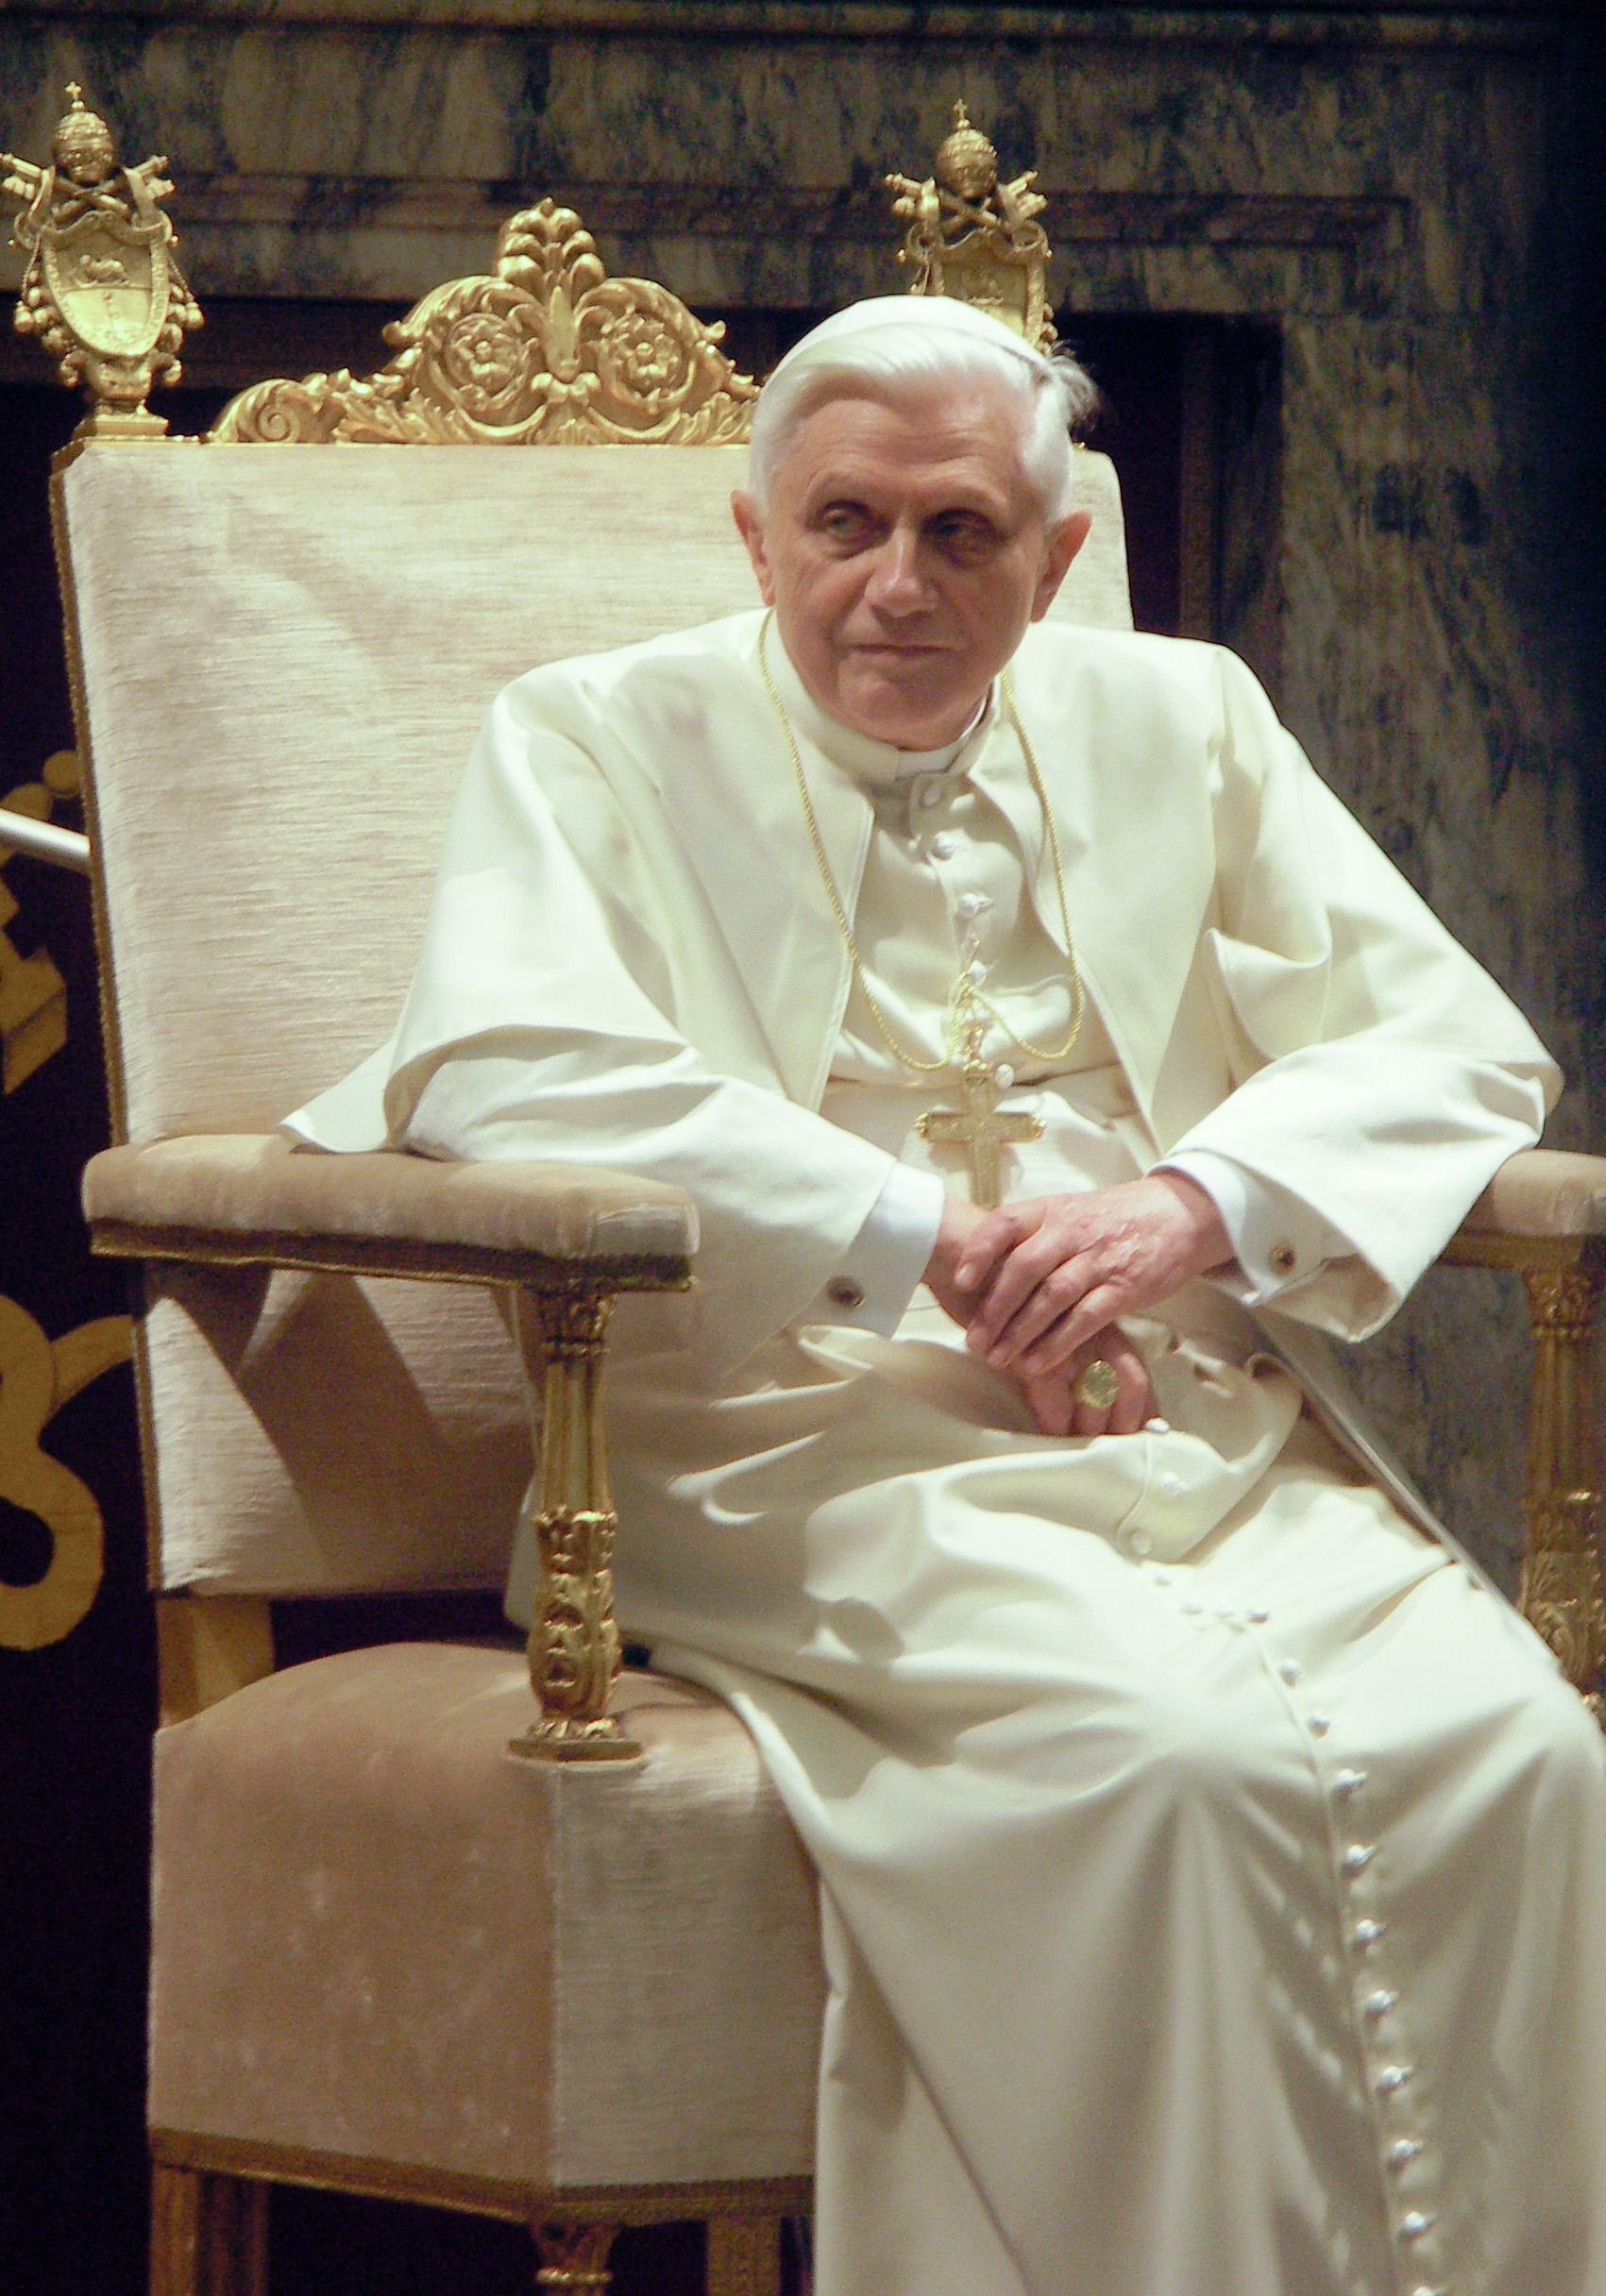 pope-benedictus-xvi-january-20-2006-2-mod